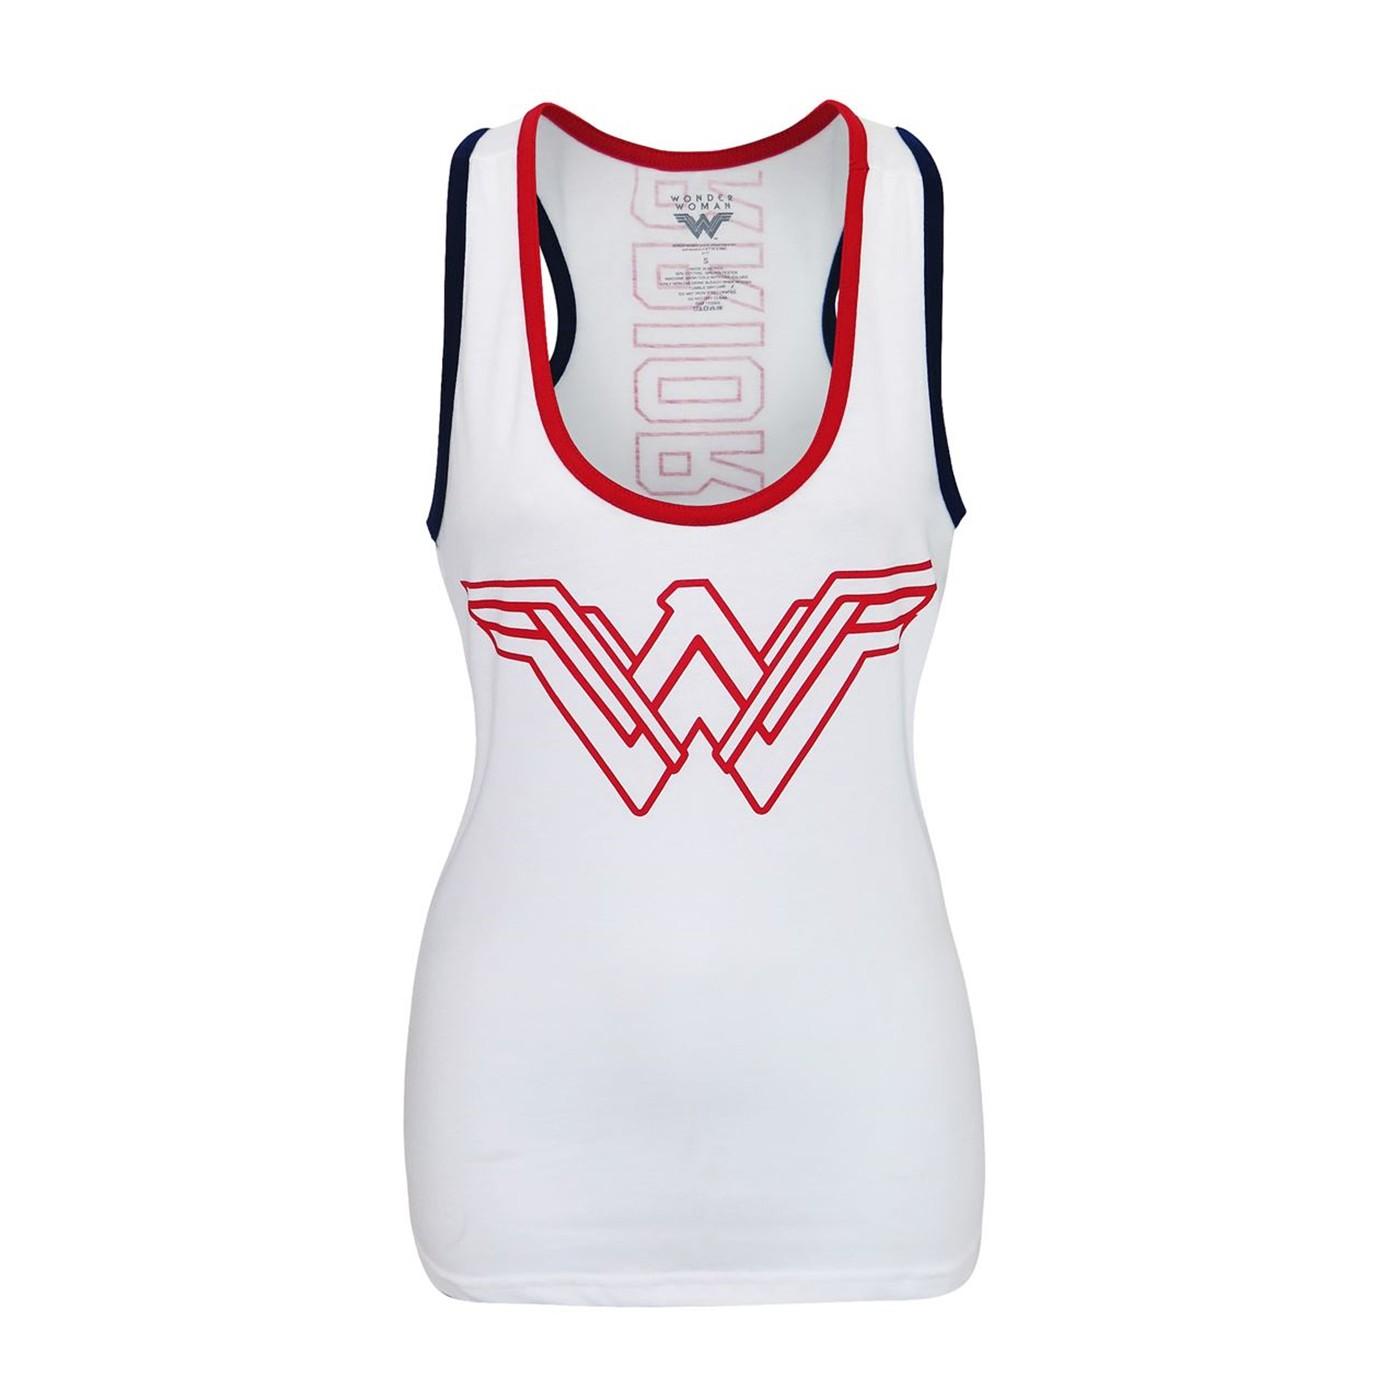 Wonder Woman Warrior Victory Women's Tank Top